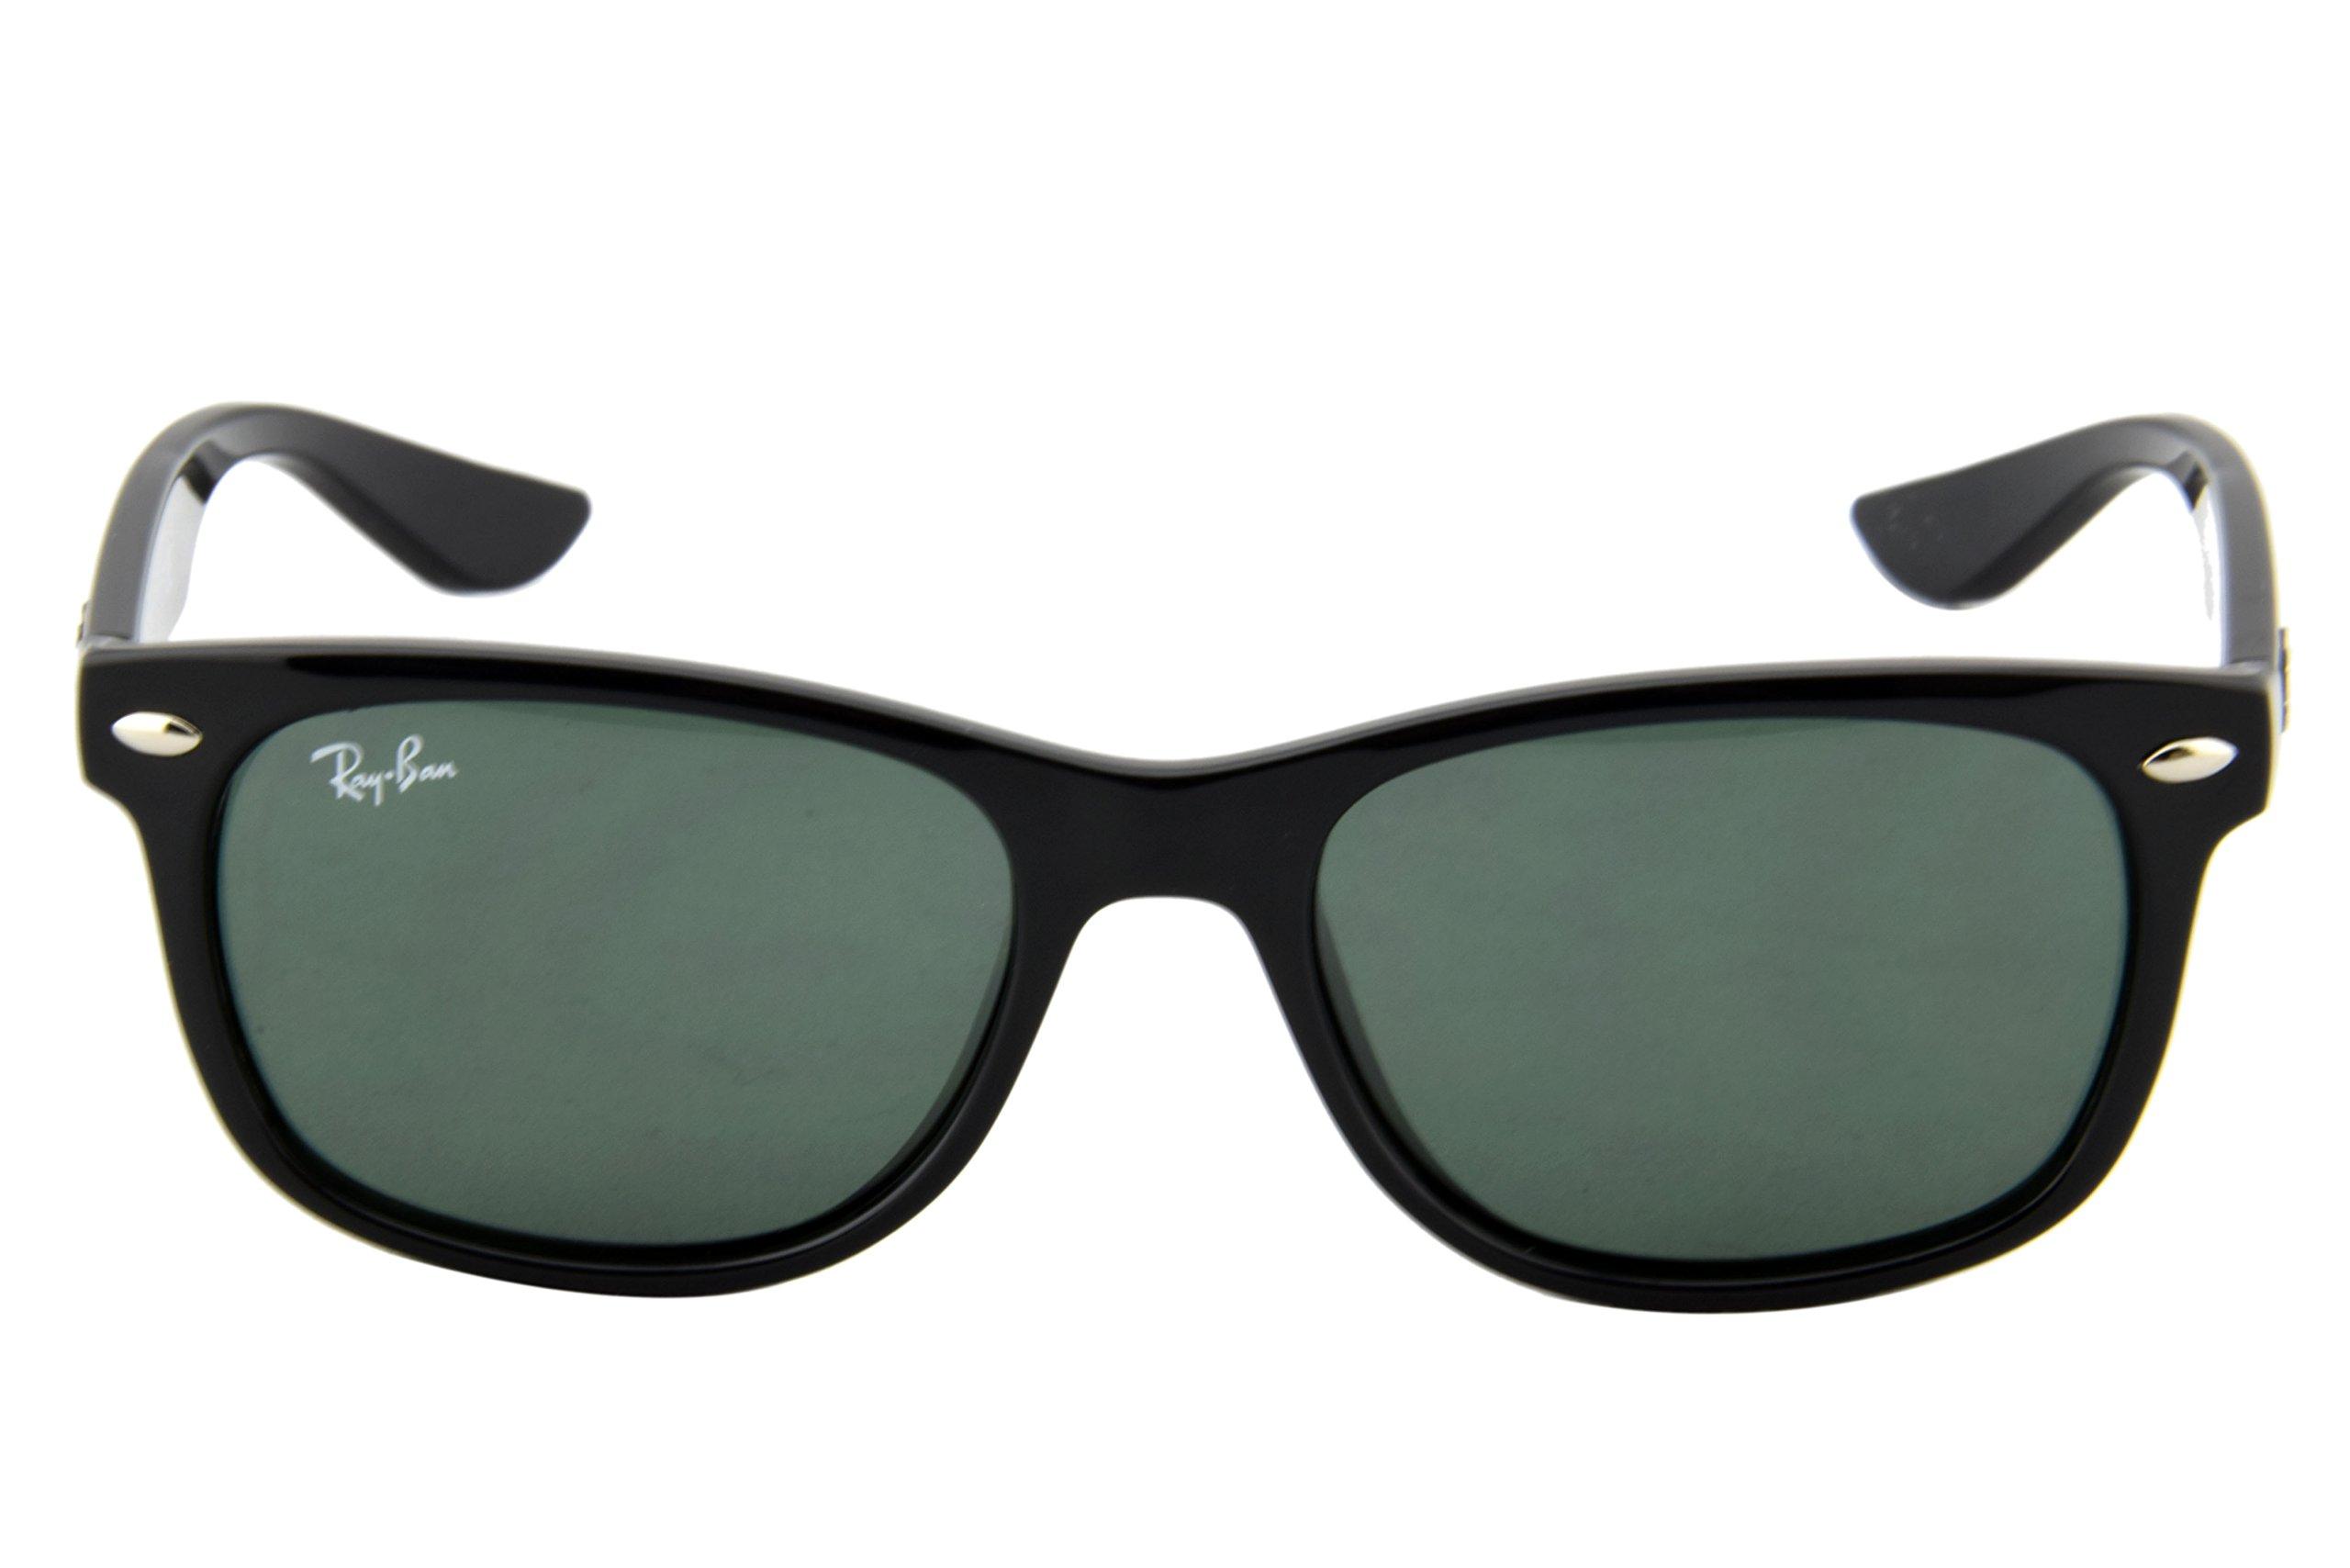 564b2ba89d ... 50% off ray ban junior wayfarer sunglasses in havana rj9052s 152 73 47  41f6b 6bf67 ...